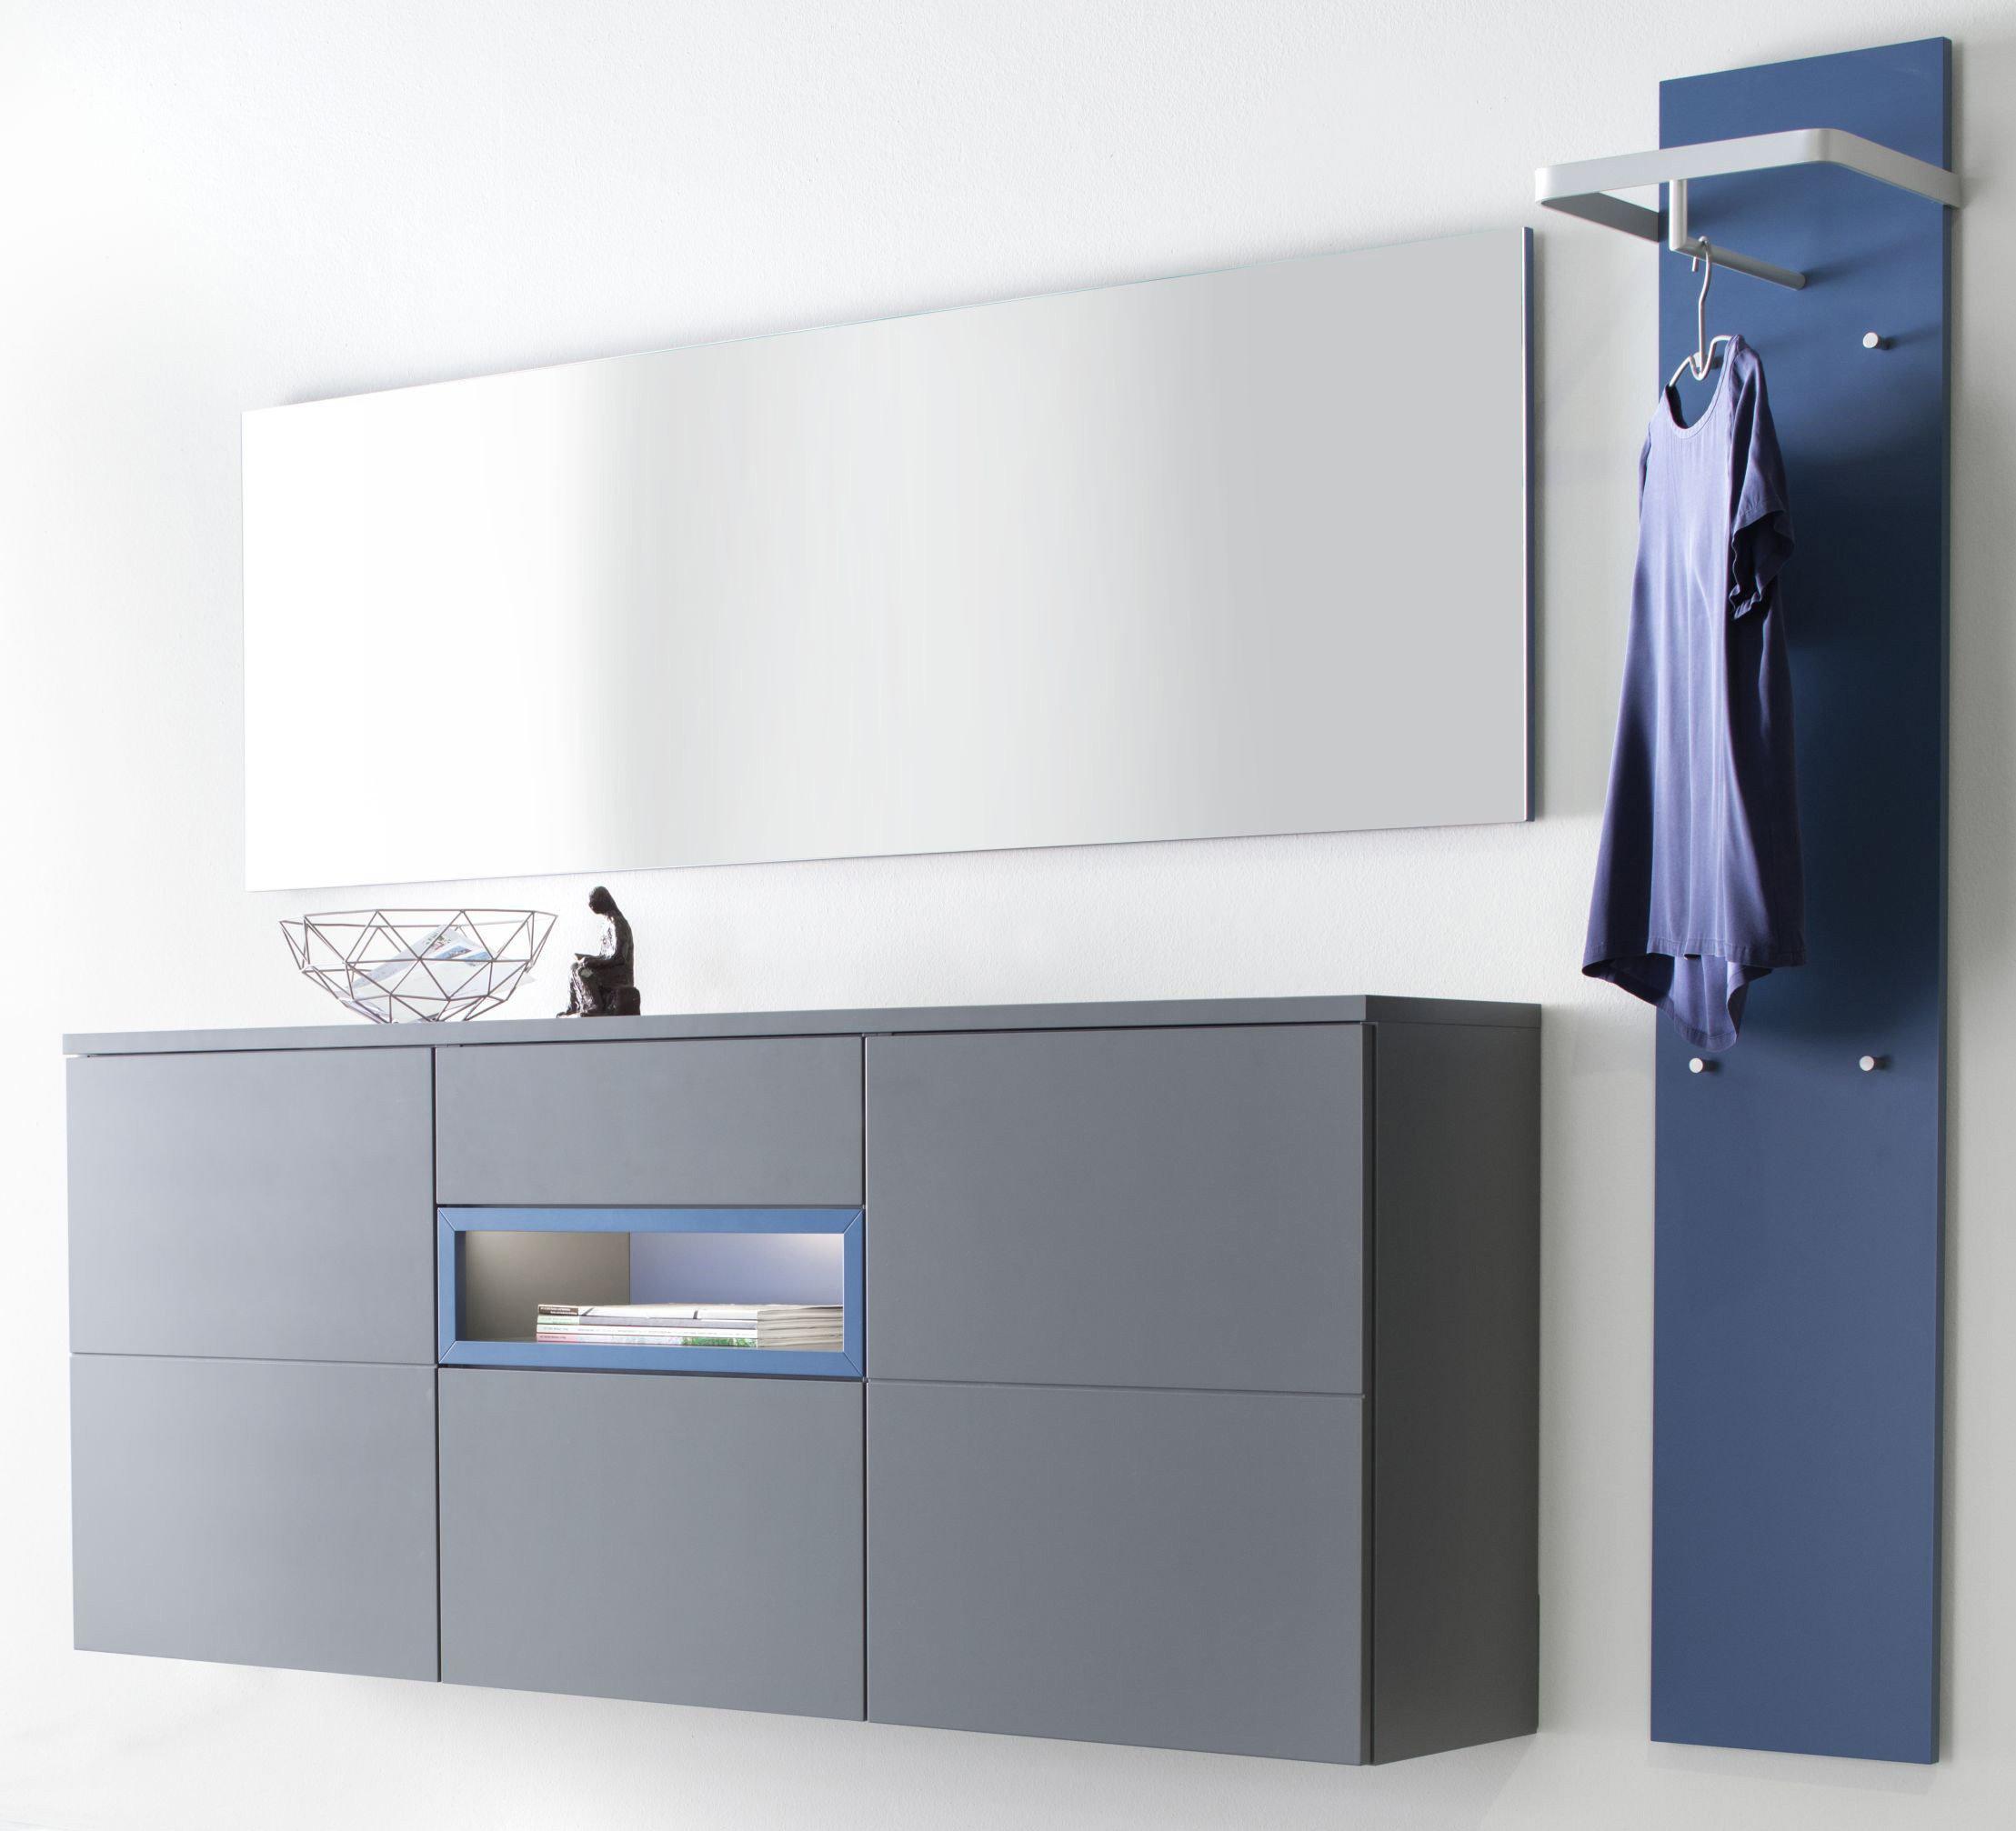 Sudbrock garderobe fox 20 m bel letz ihr online shop - Sudbrock garderobe ...